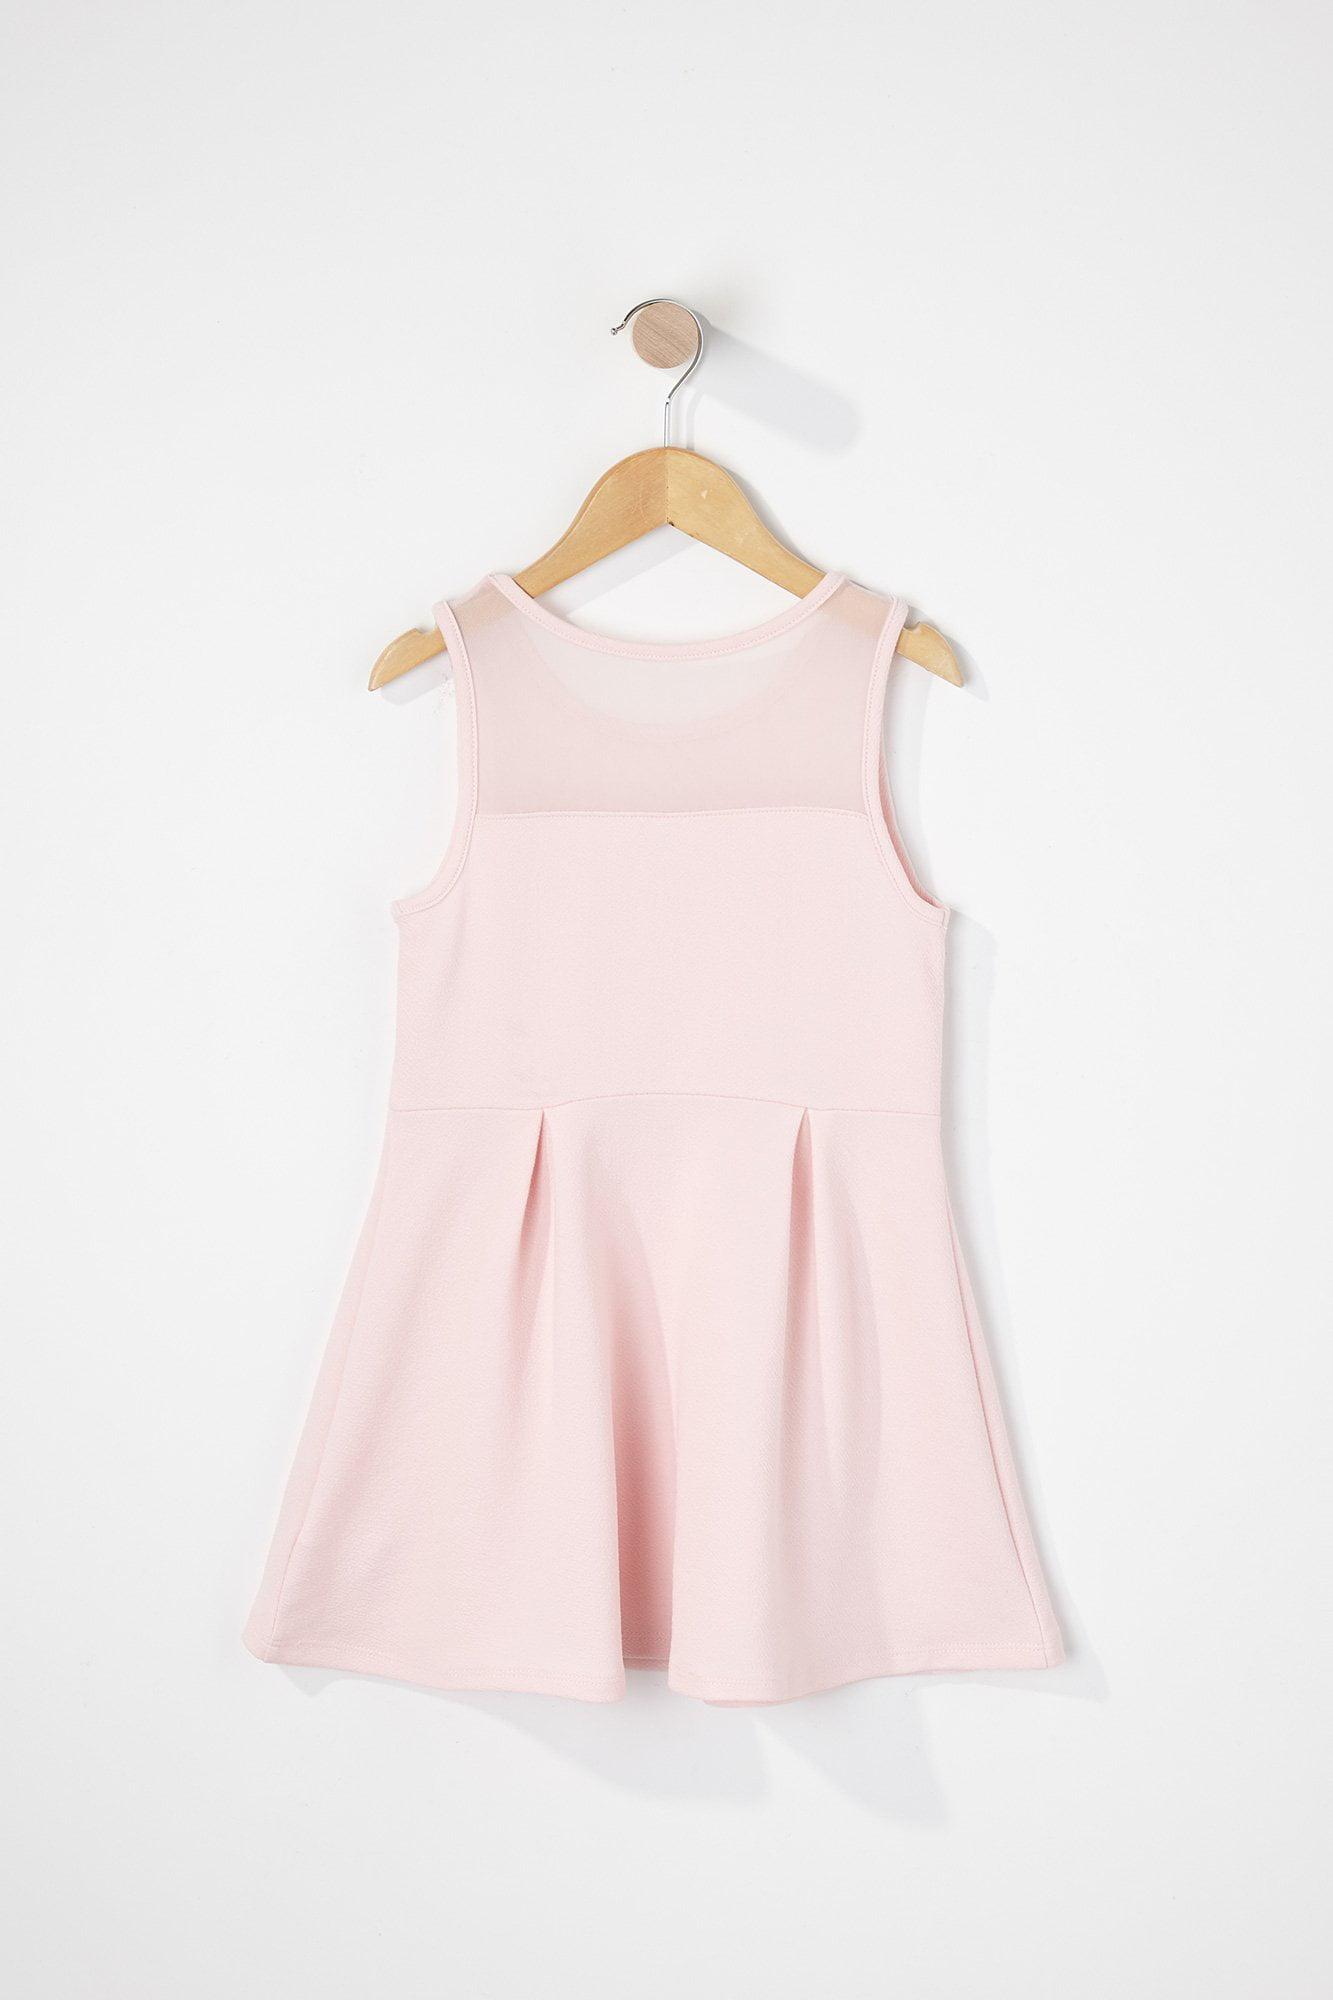 NEW Toddler Girls Sun Dress Size 2T Pink Yellow Stripe Fisher Price Summer